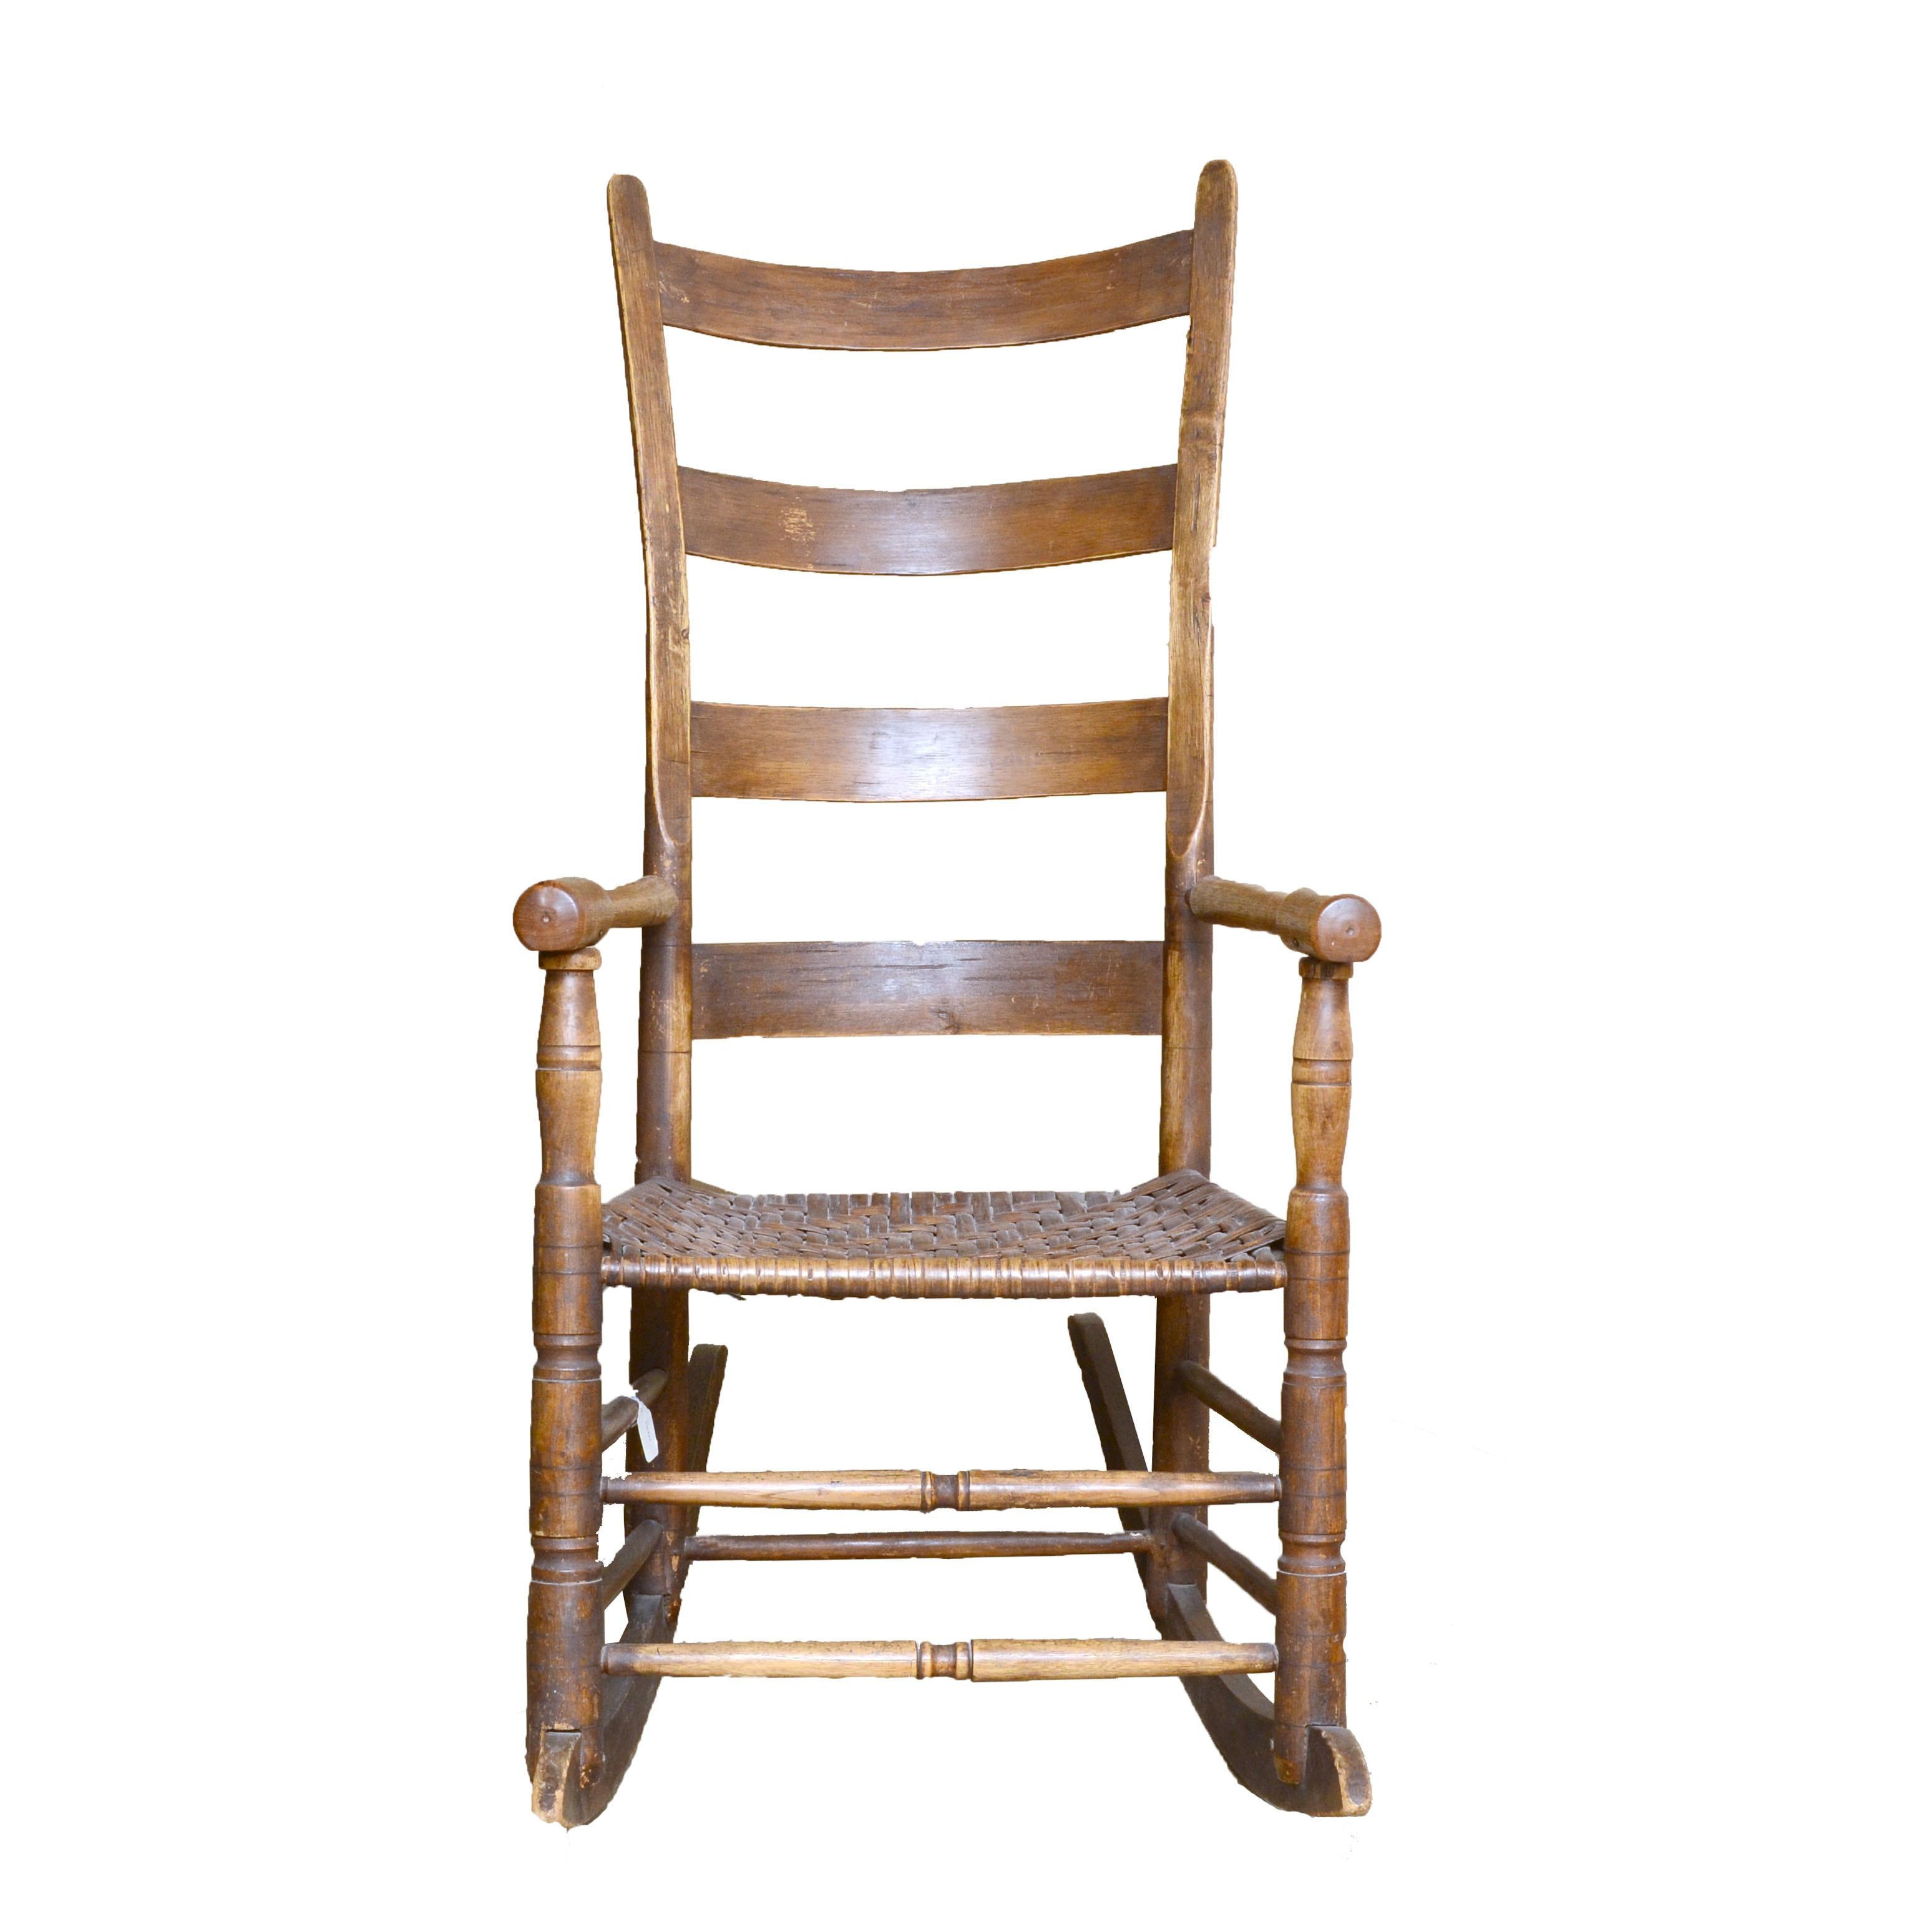 19th Century Oak Ladder Back Rocking Chair